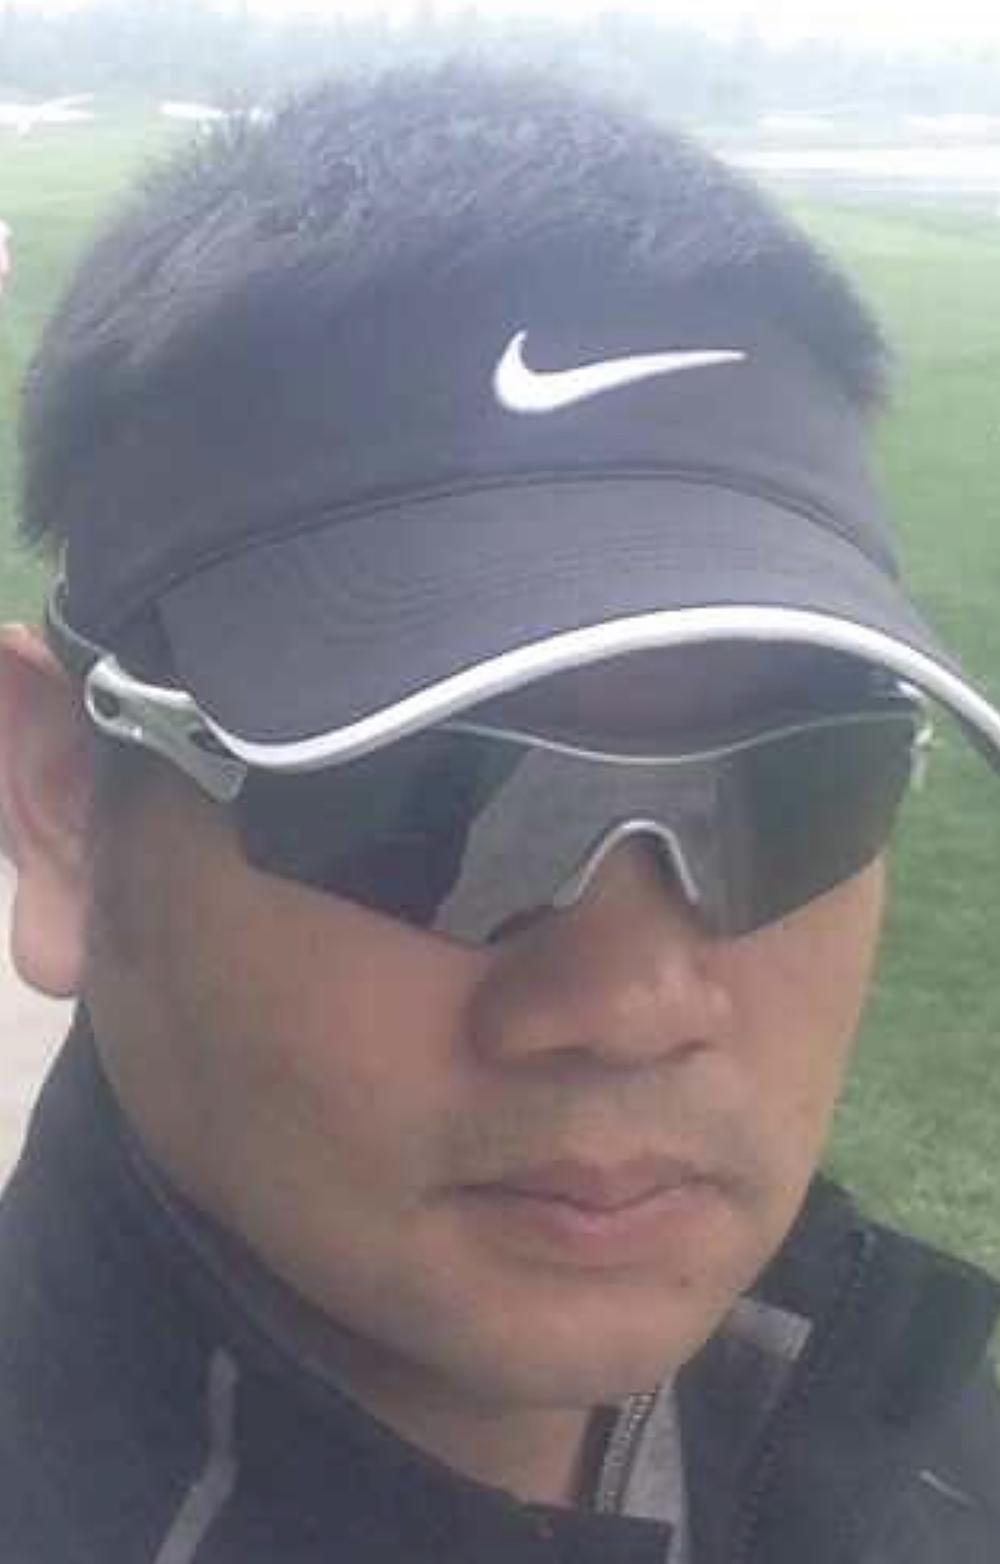 Gary Ho Hong Kong Conatct: gary.cy.ho@hotmail.com